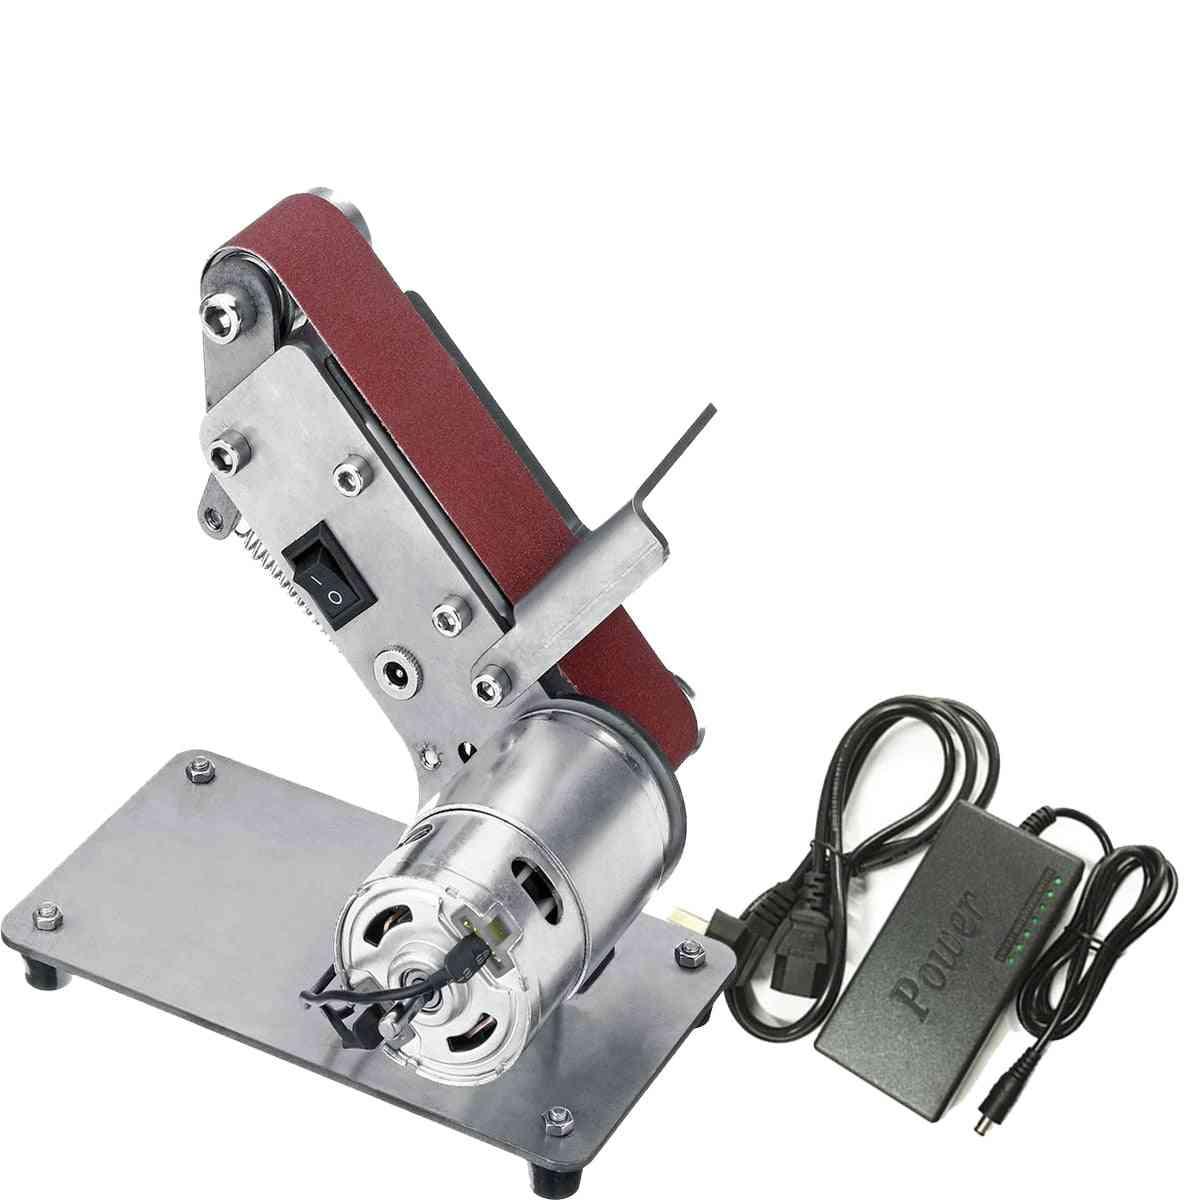 300w Electric Belt Sander Polishing Grinder Machine